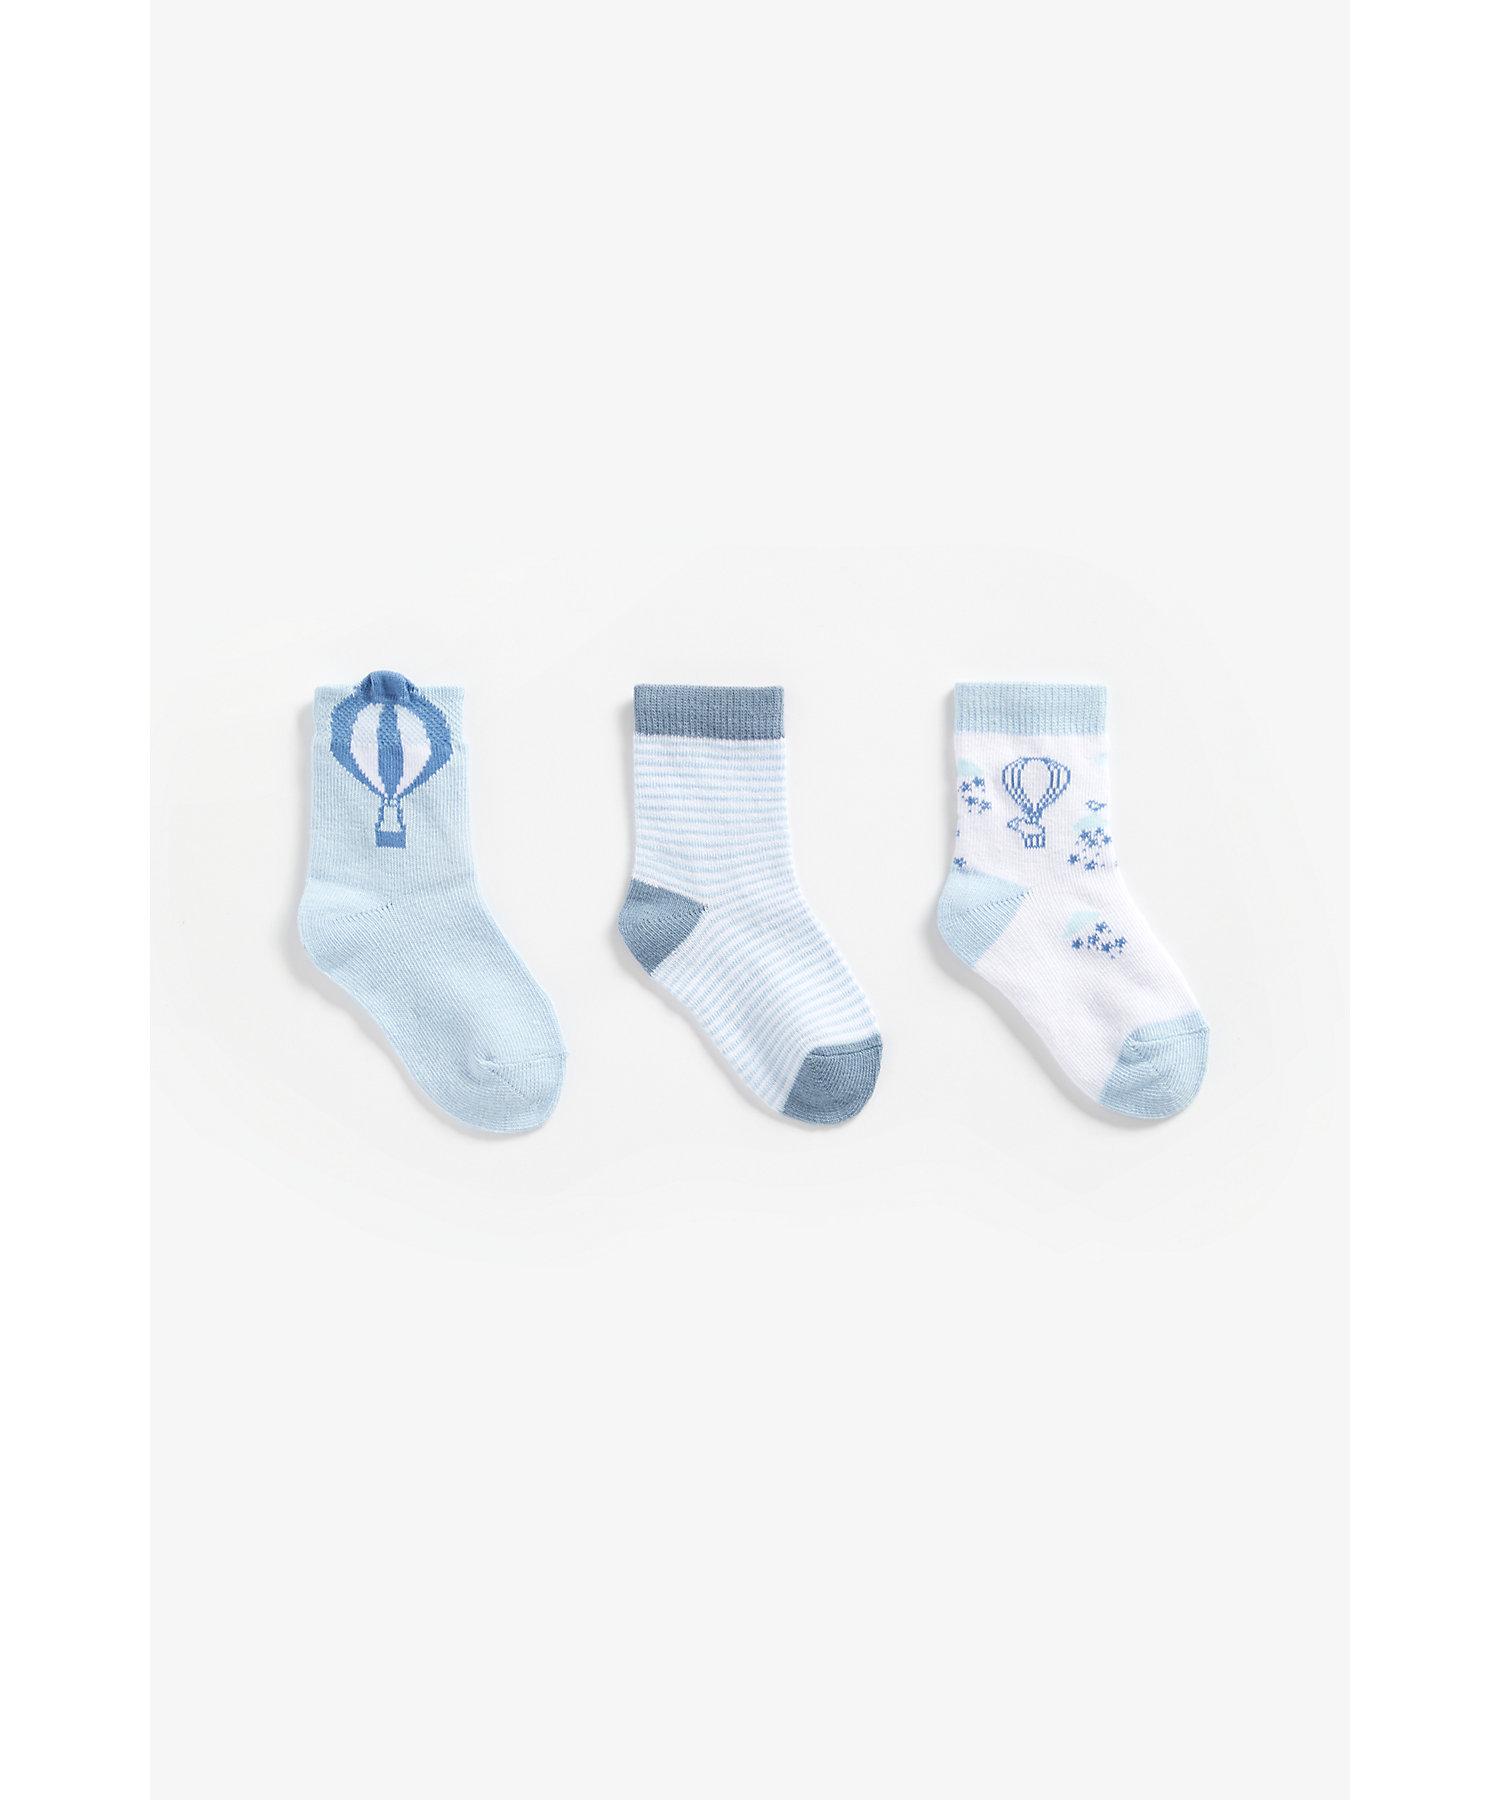 Mothercare   Boys Socks Hot Air Balloon Design - Pack Of 3 - Blue